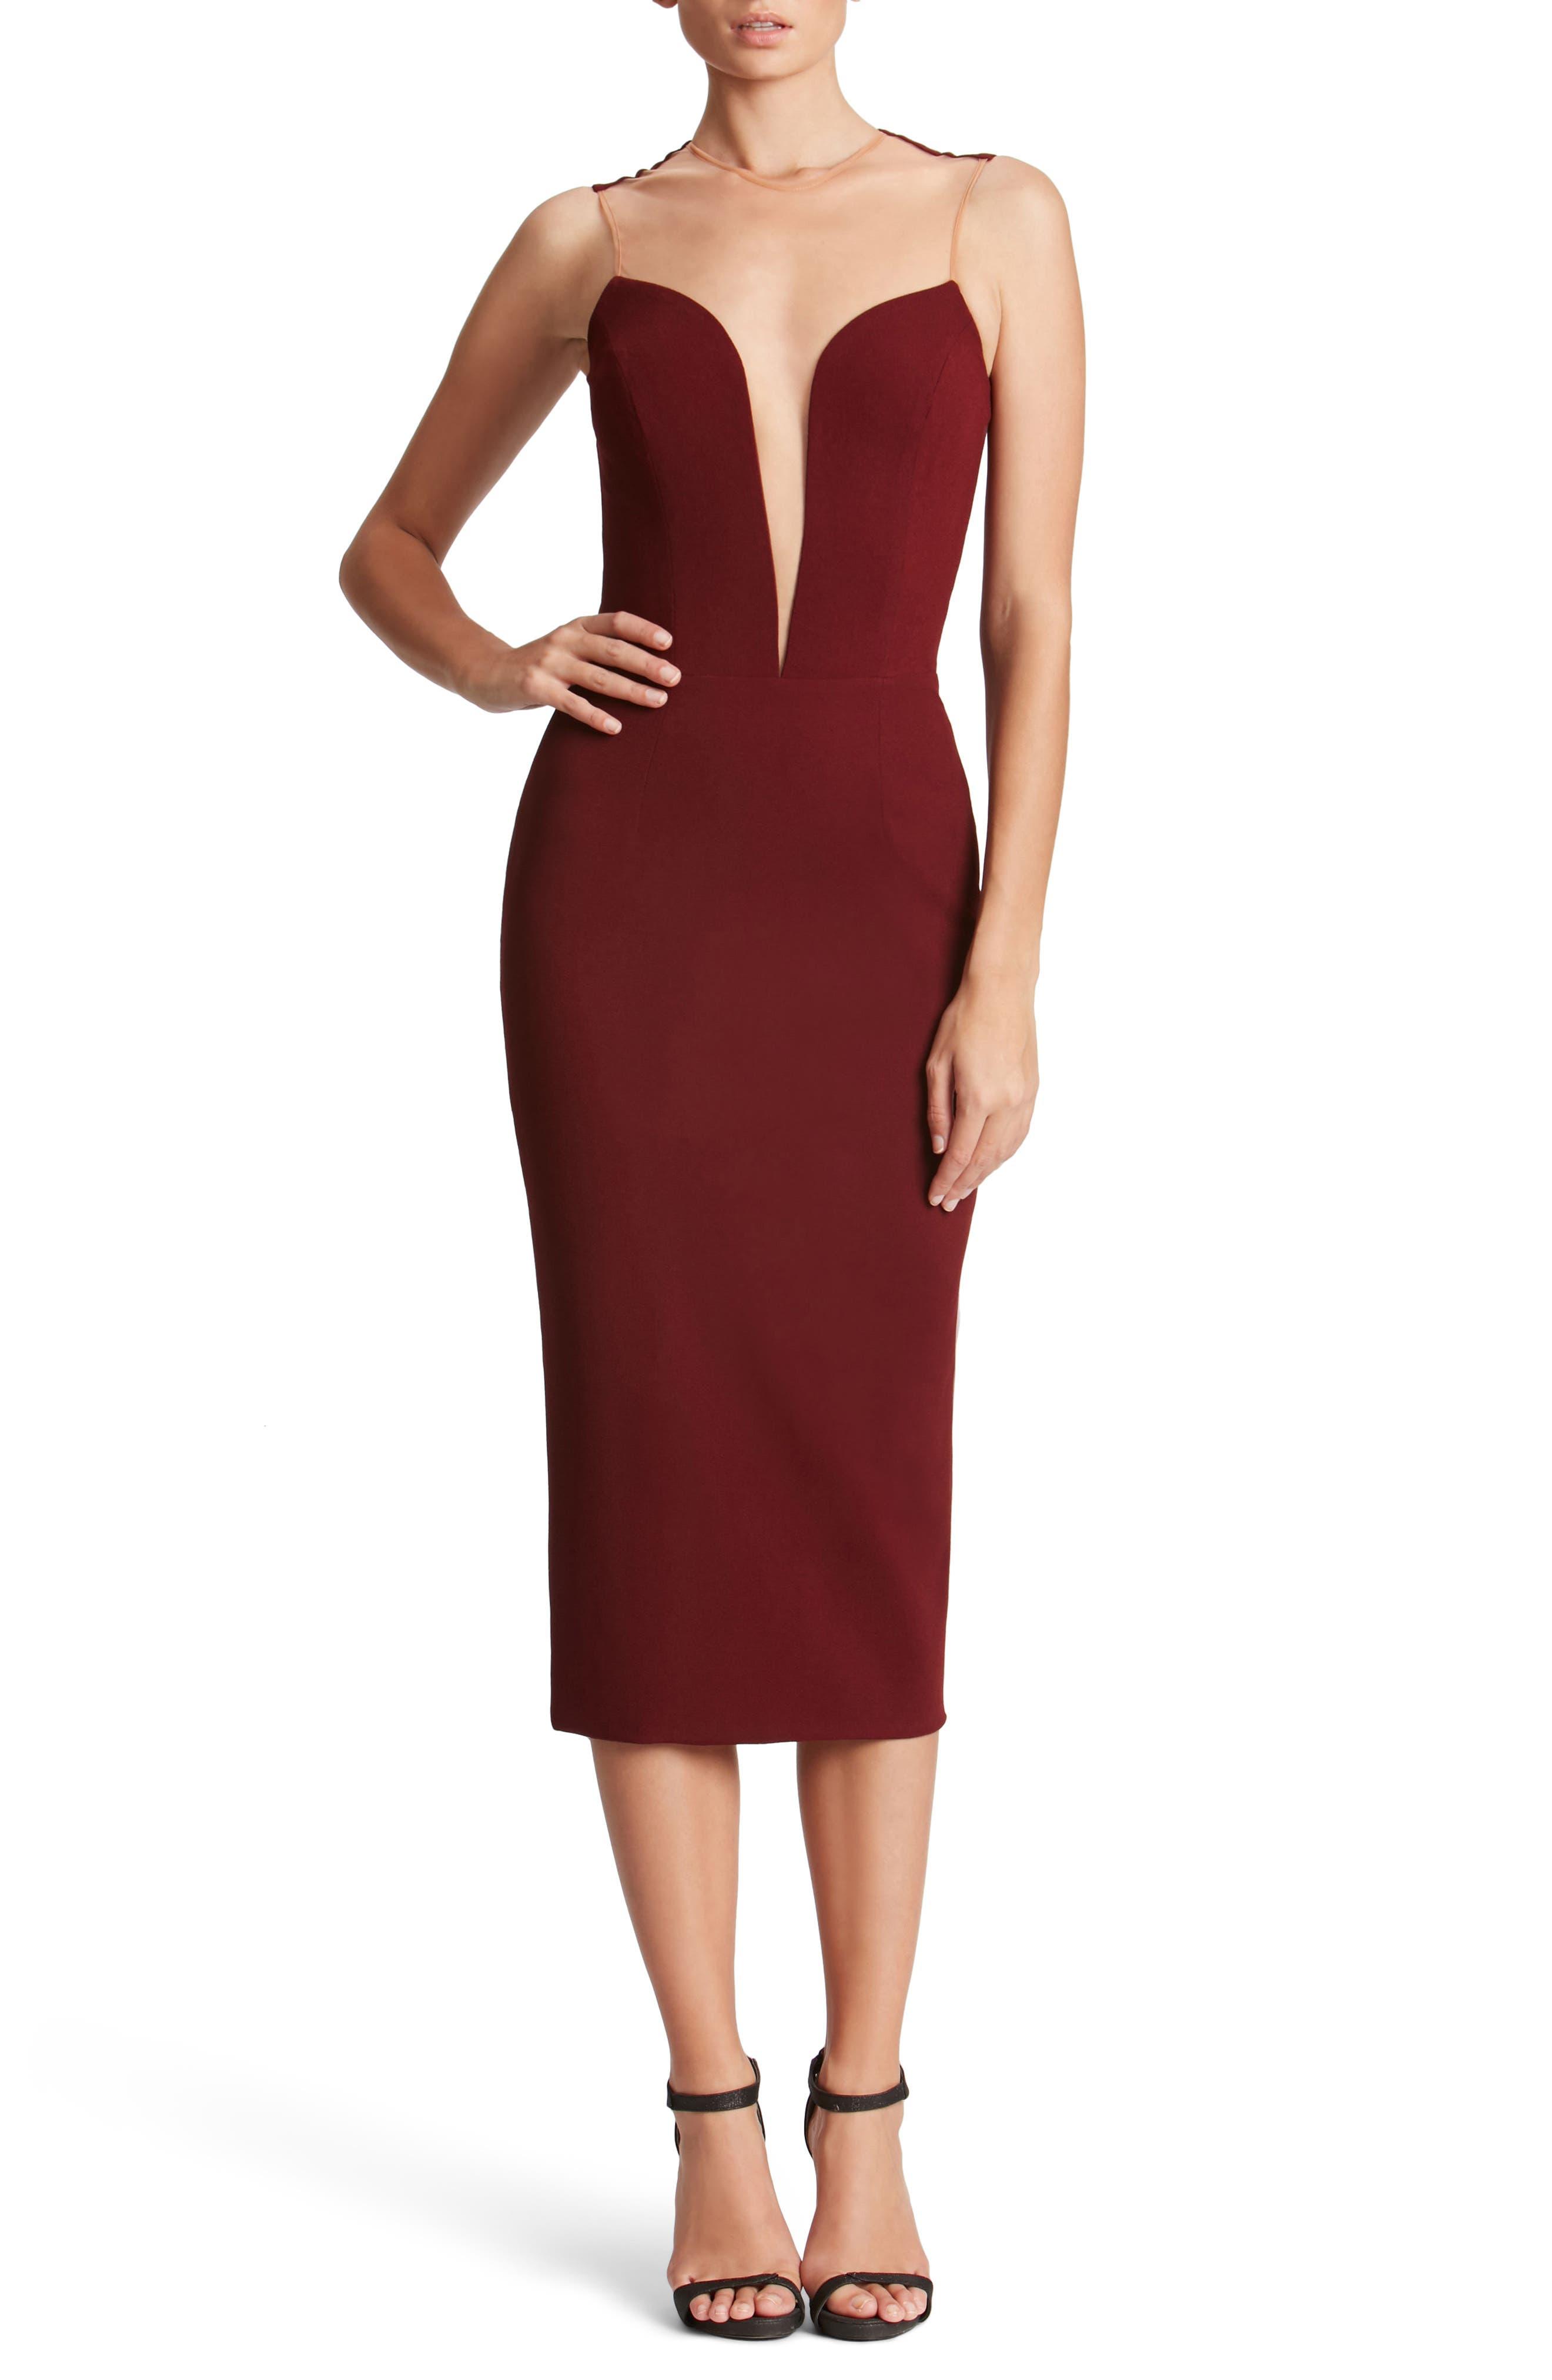 Helen Plunge Neck Midi Dress,                             Main thumbnail 1, color,                             Burgundy